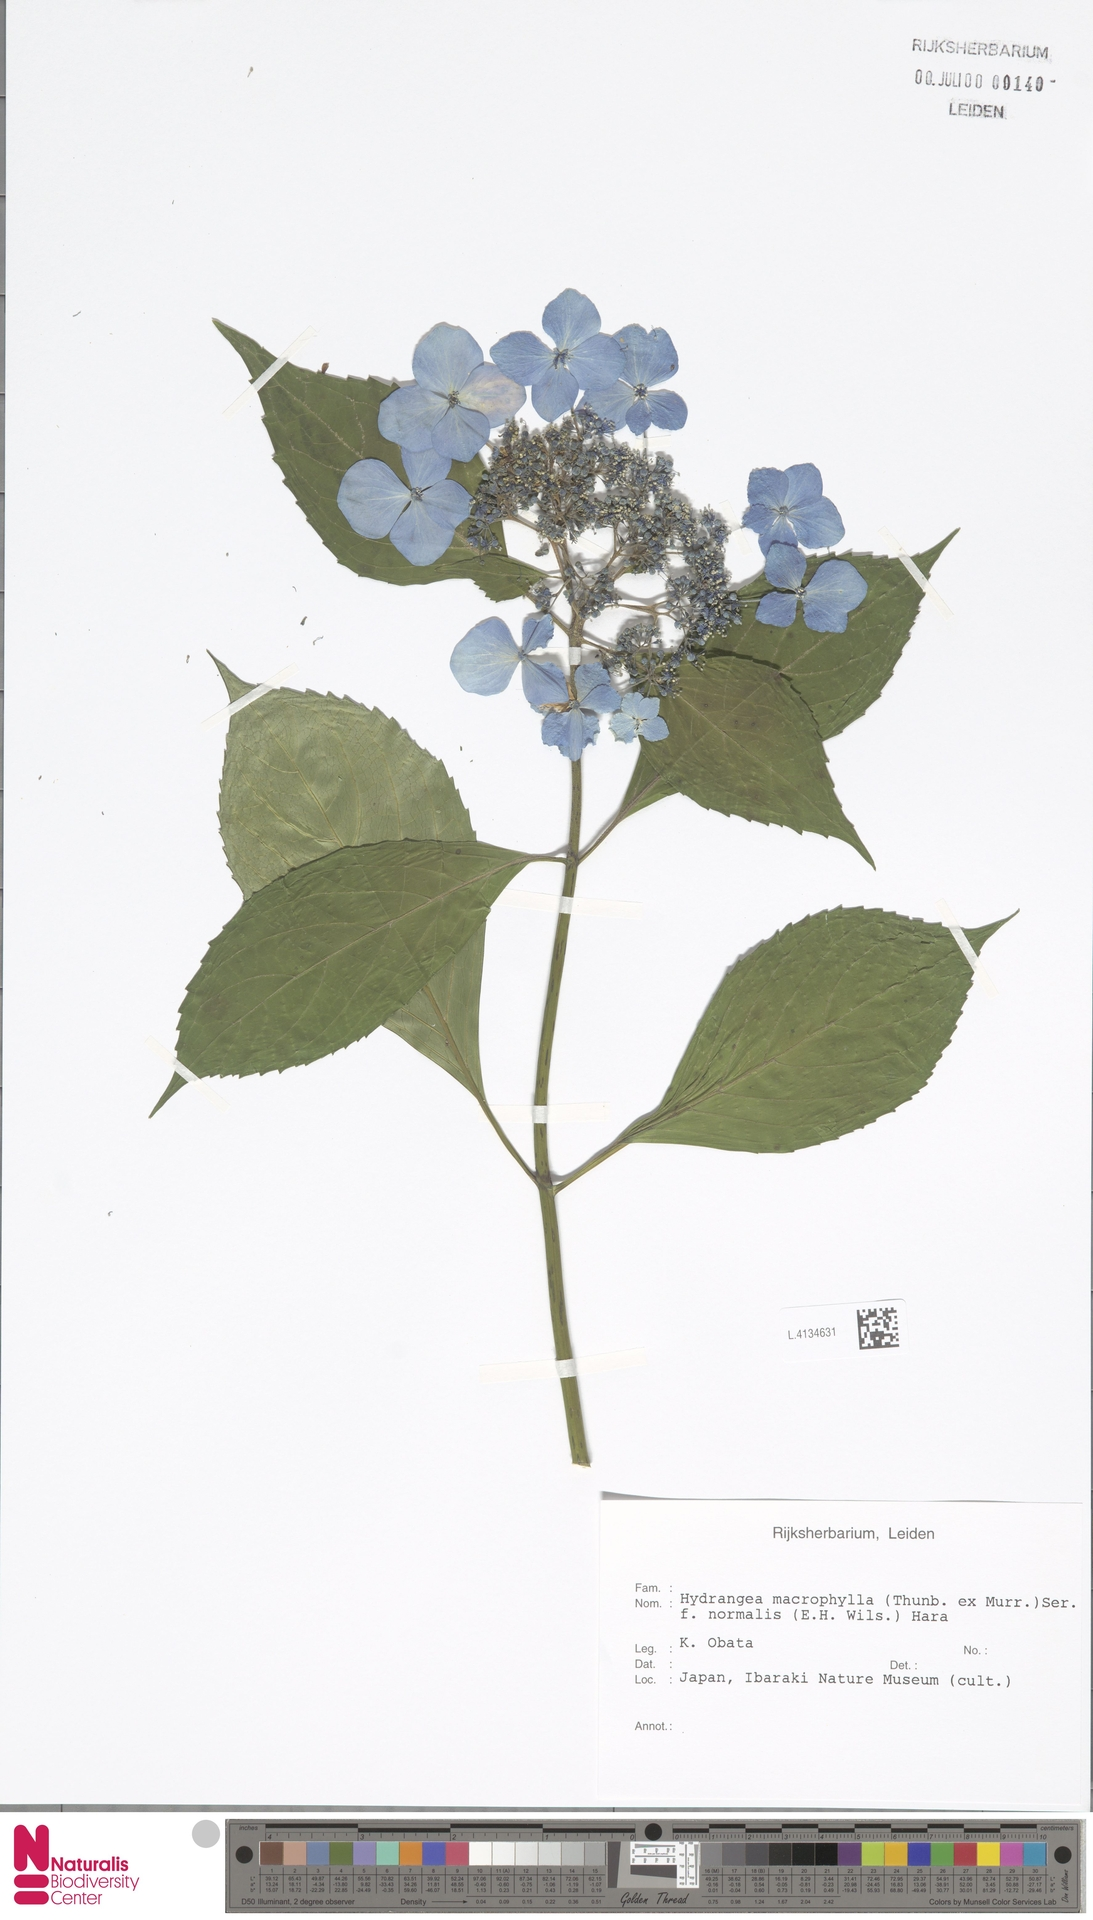 L.4134631   Hydrangea macrophylla f. normalis